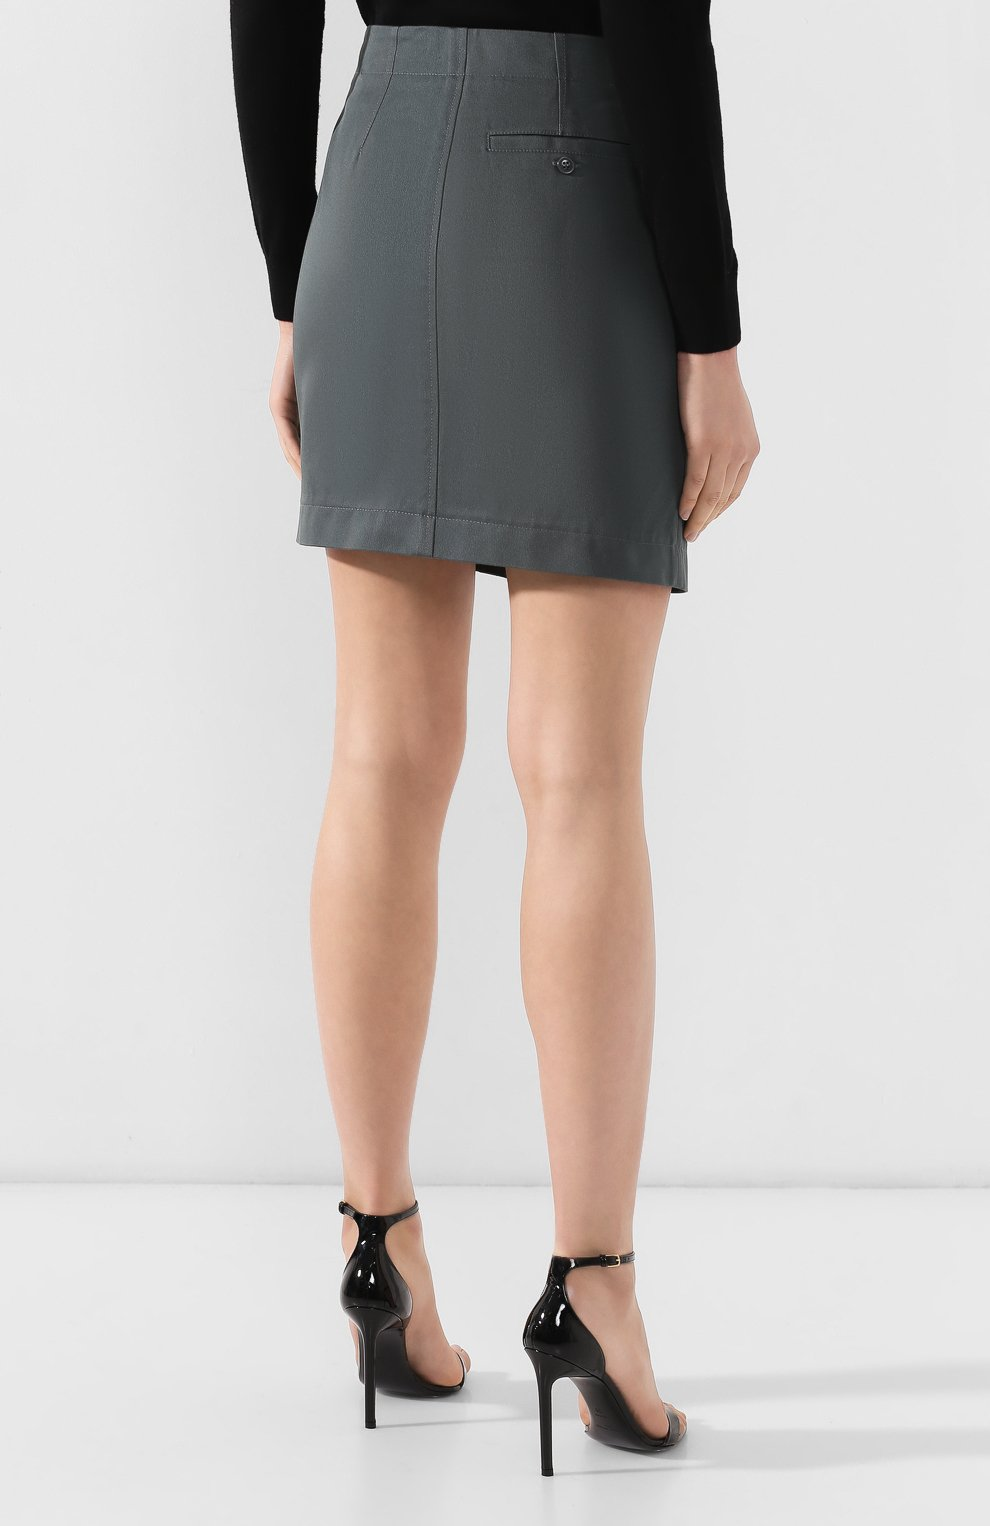 Хлопковая юбка Givenchy темно-зеленая | Фото №4